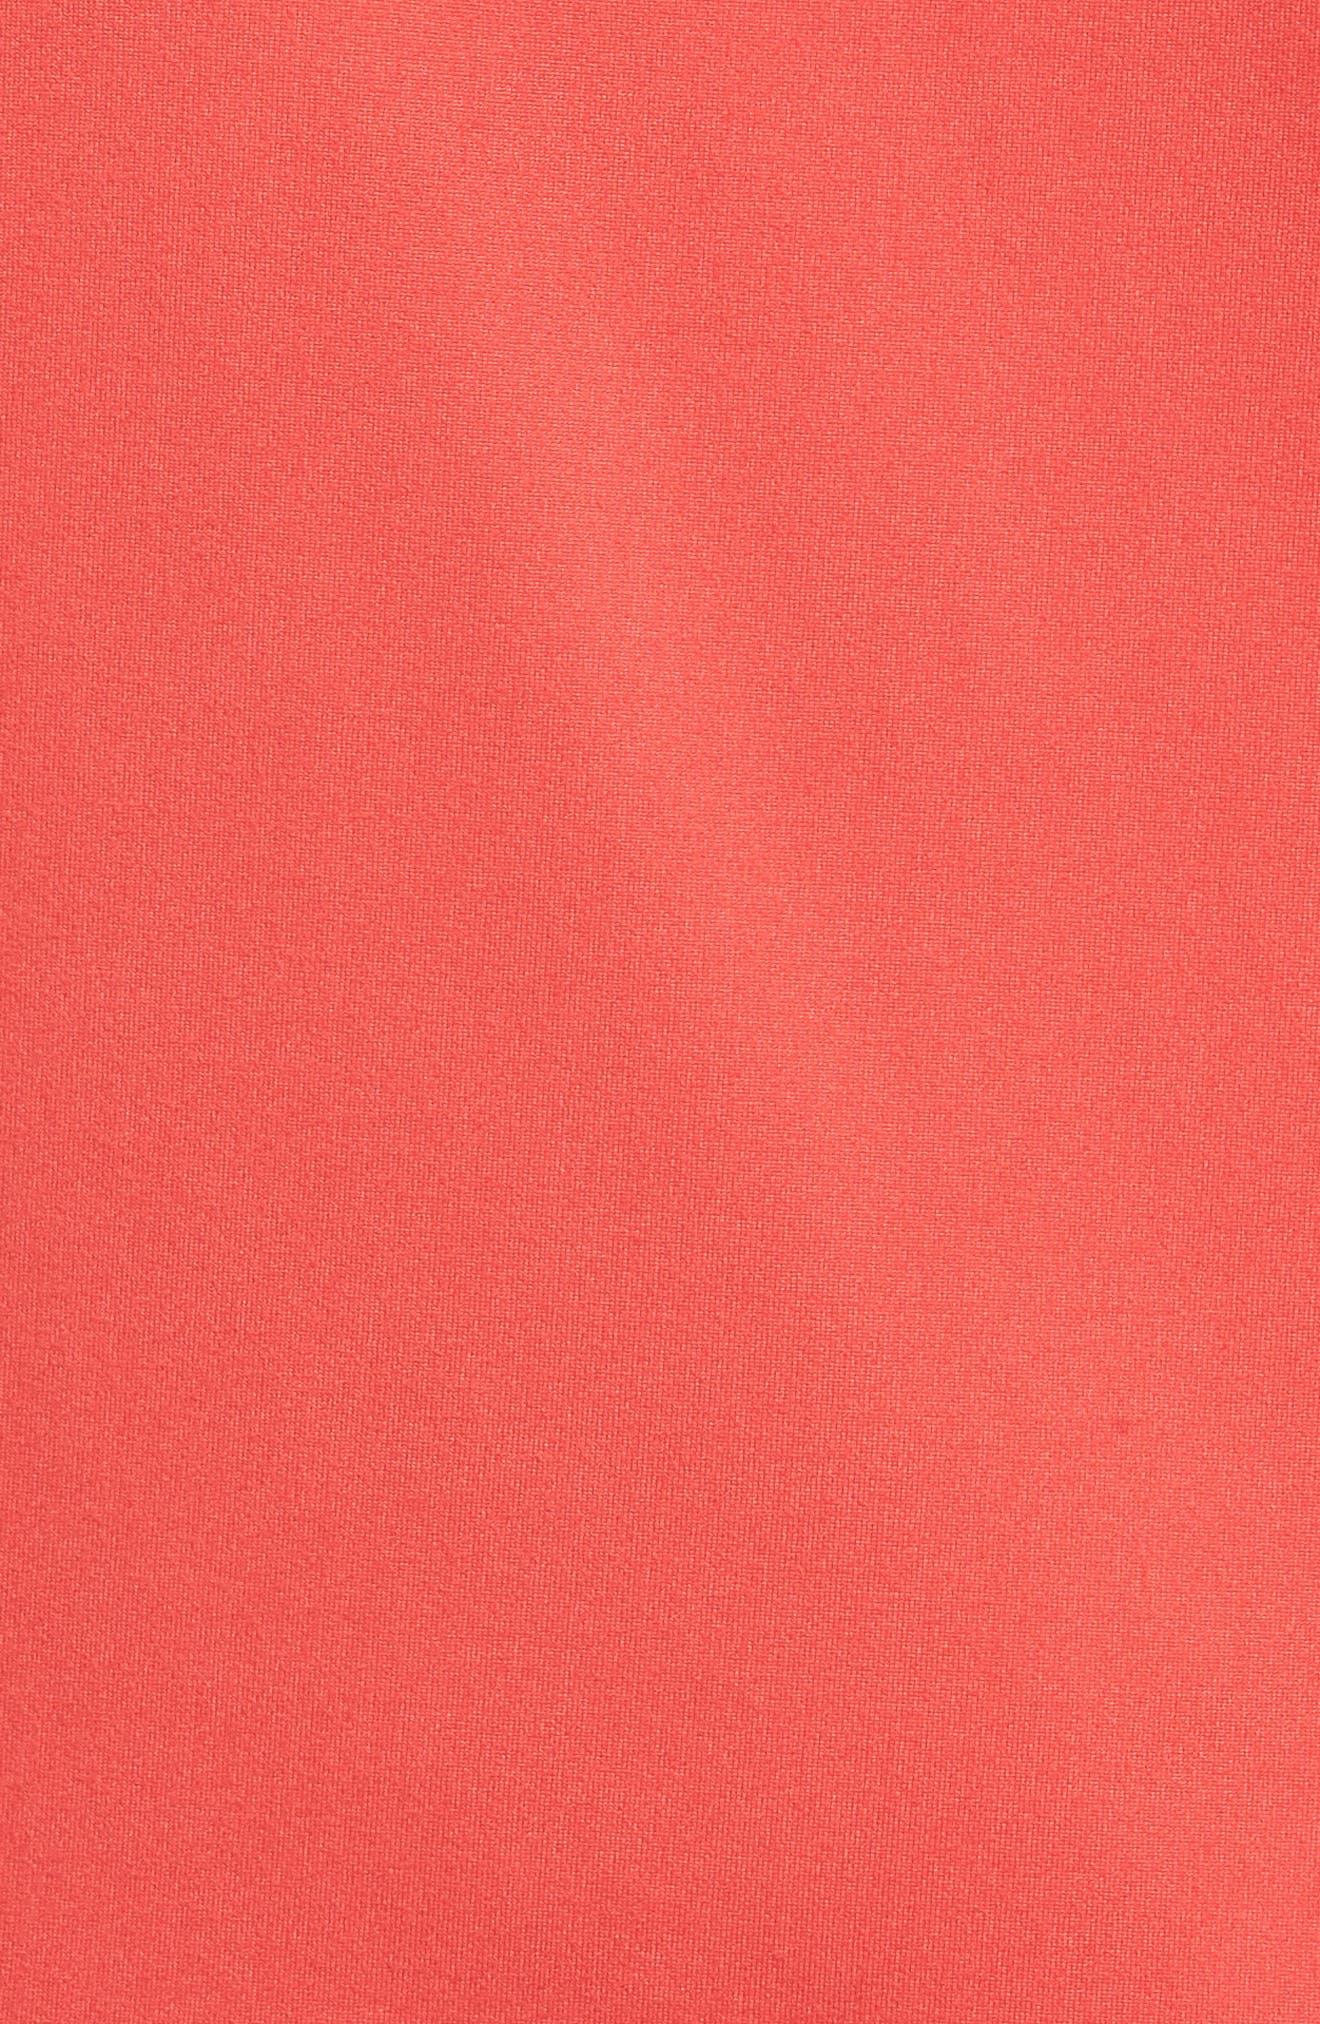 Alternate Image 5  - Halogen® Stretch Knit Top (Regular & Petite)